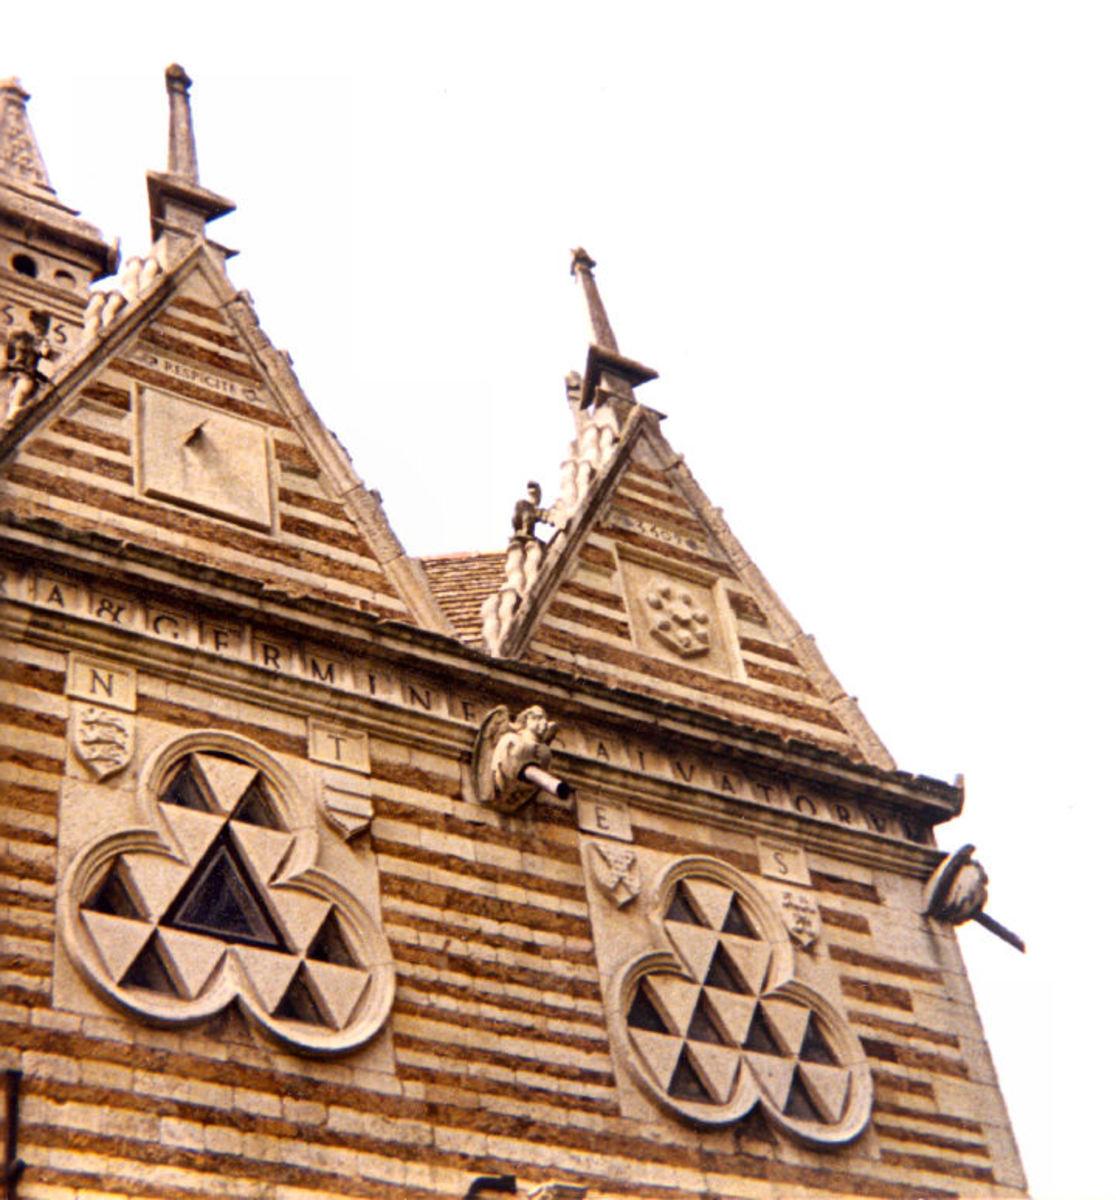 Sir Thomas Tresham's Intriguing Tudor Triangular Lodge - Rushton (Northants. UK)